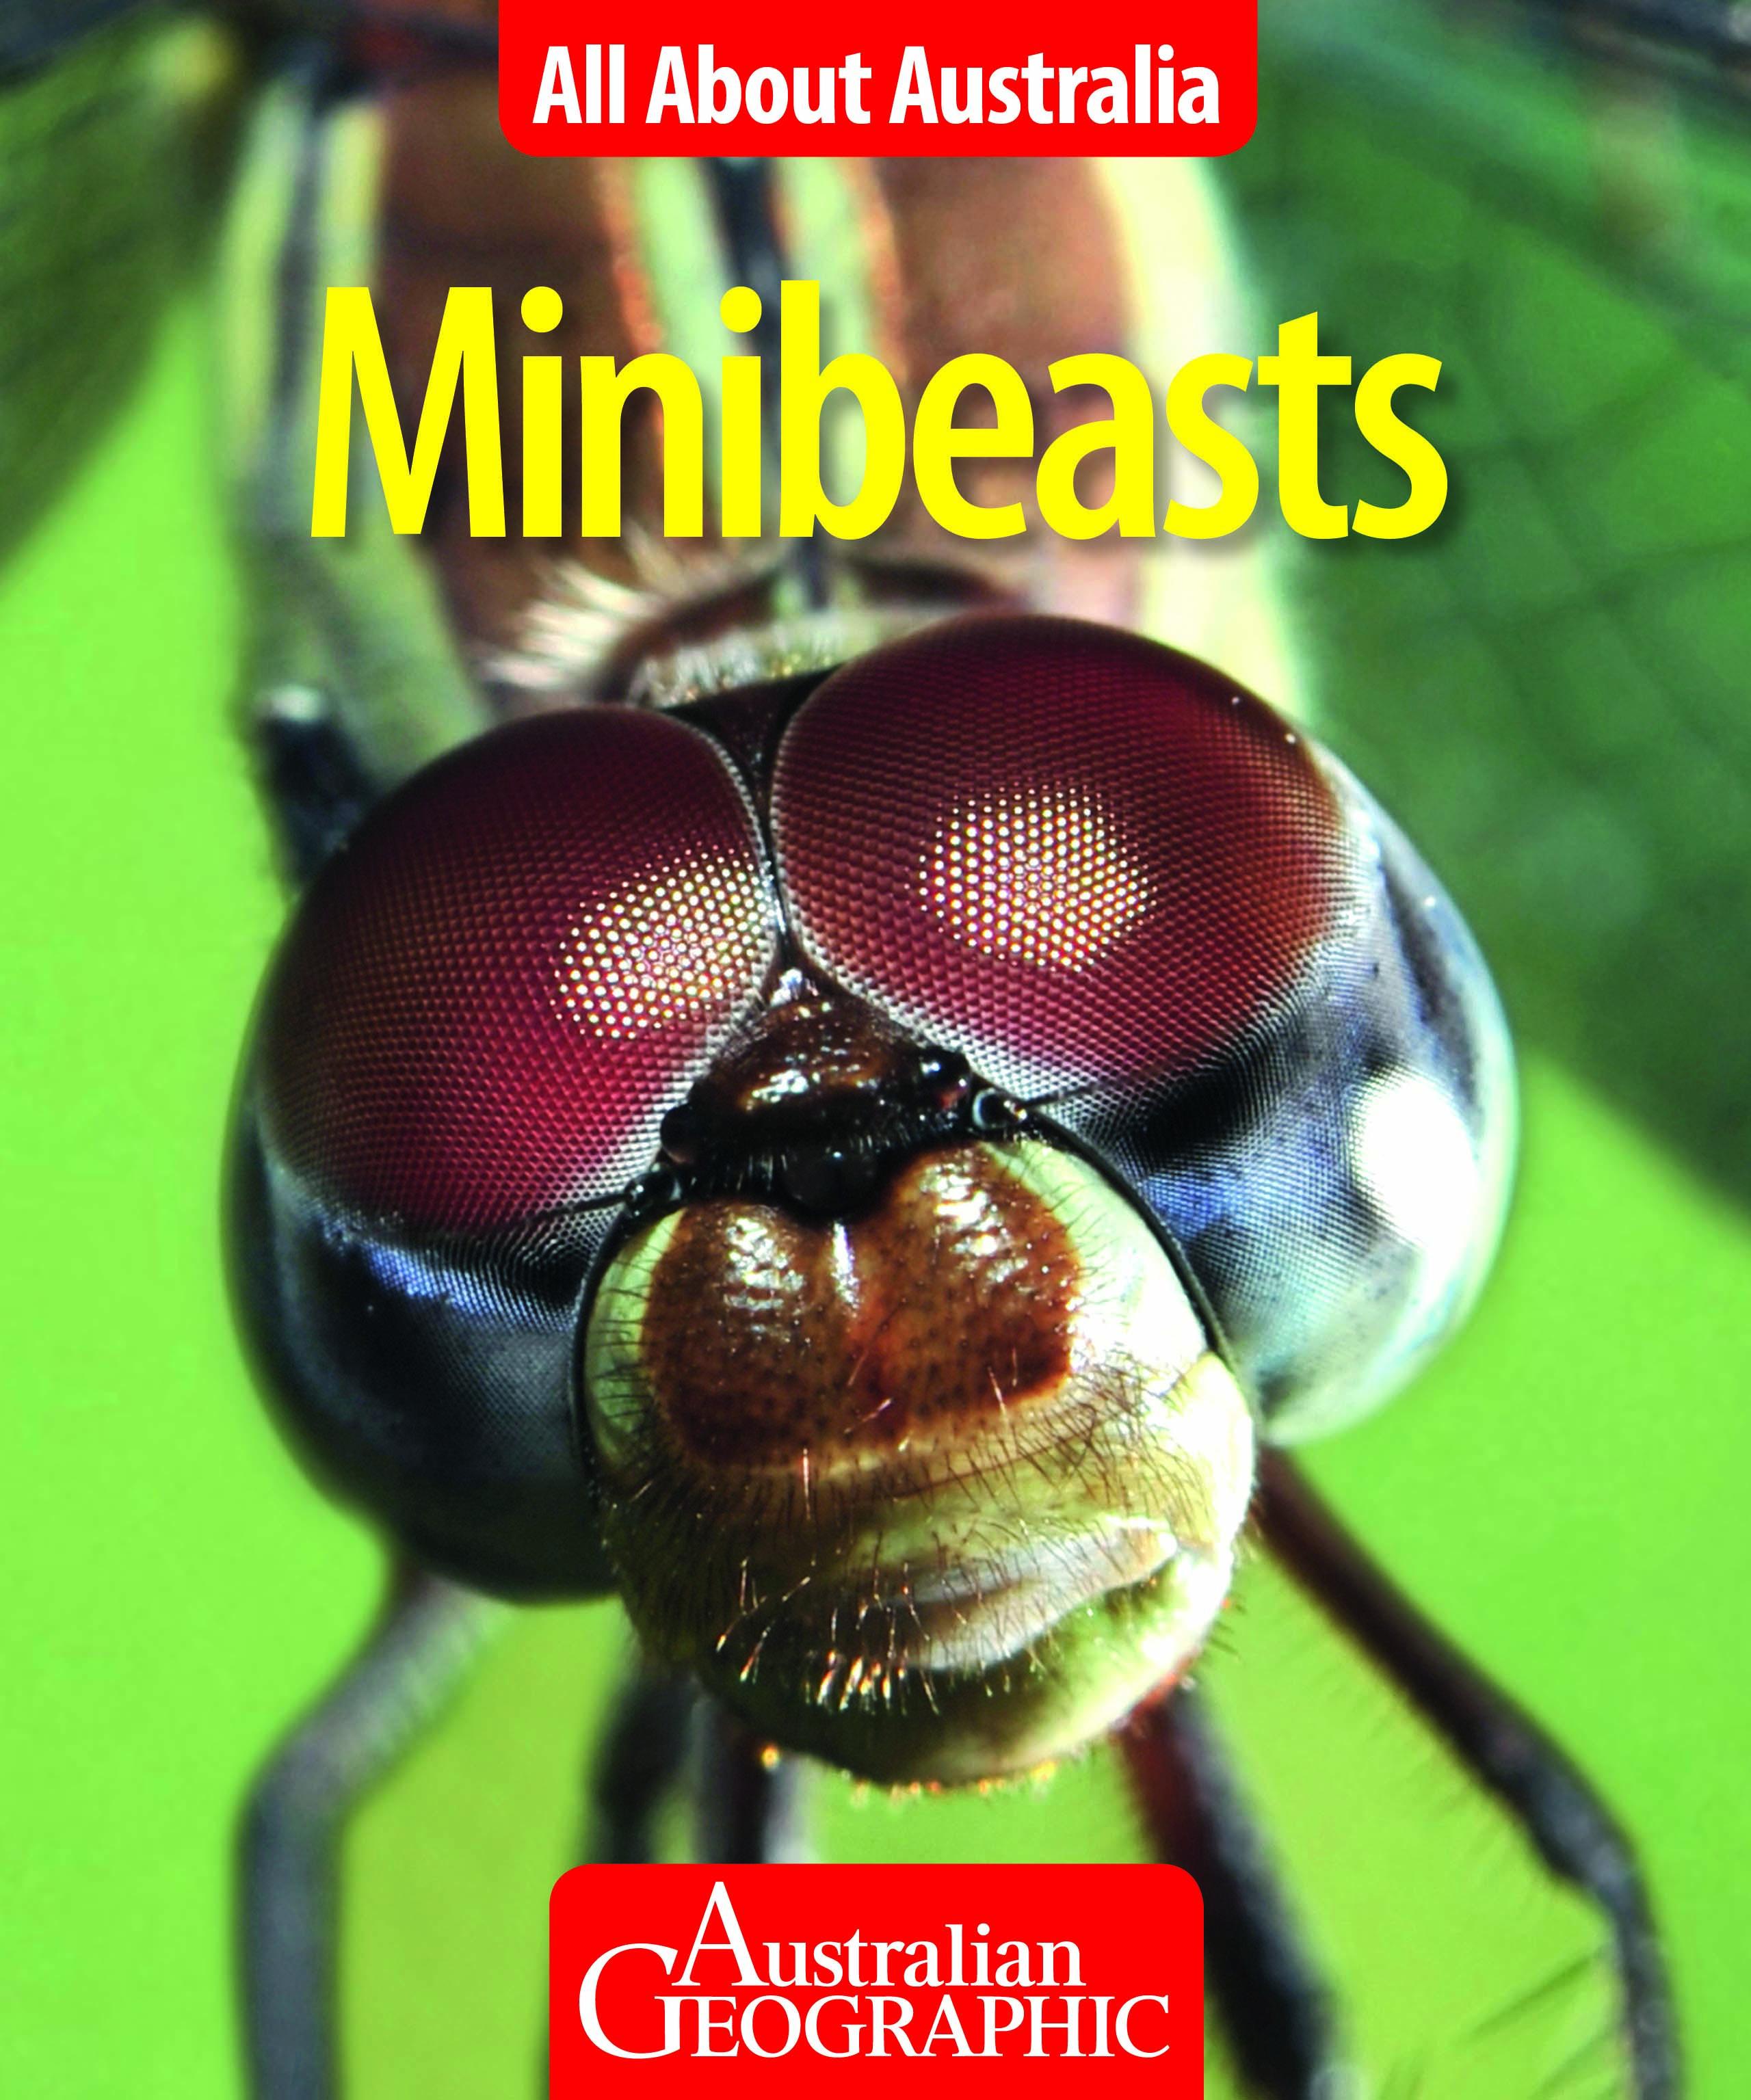 Minibeats